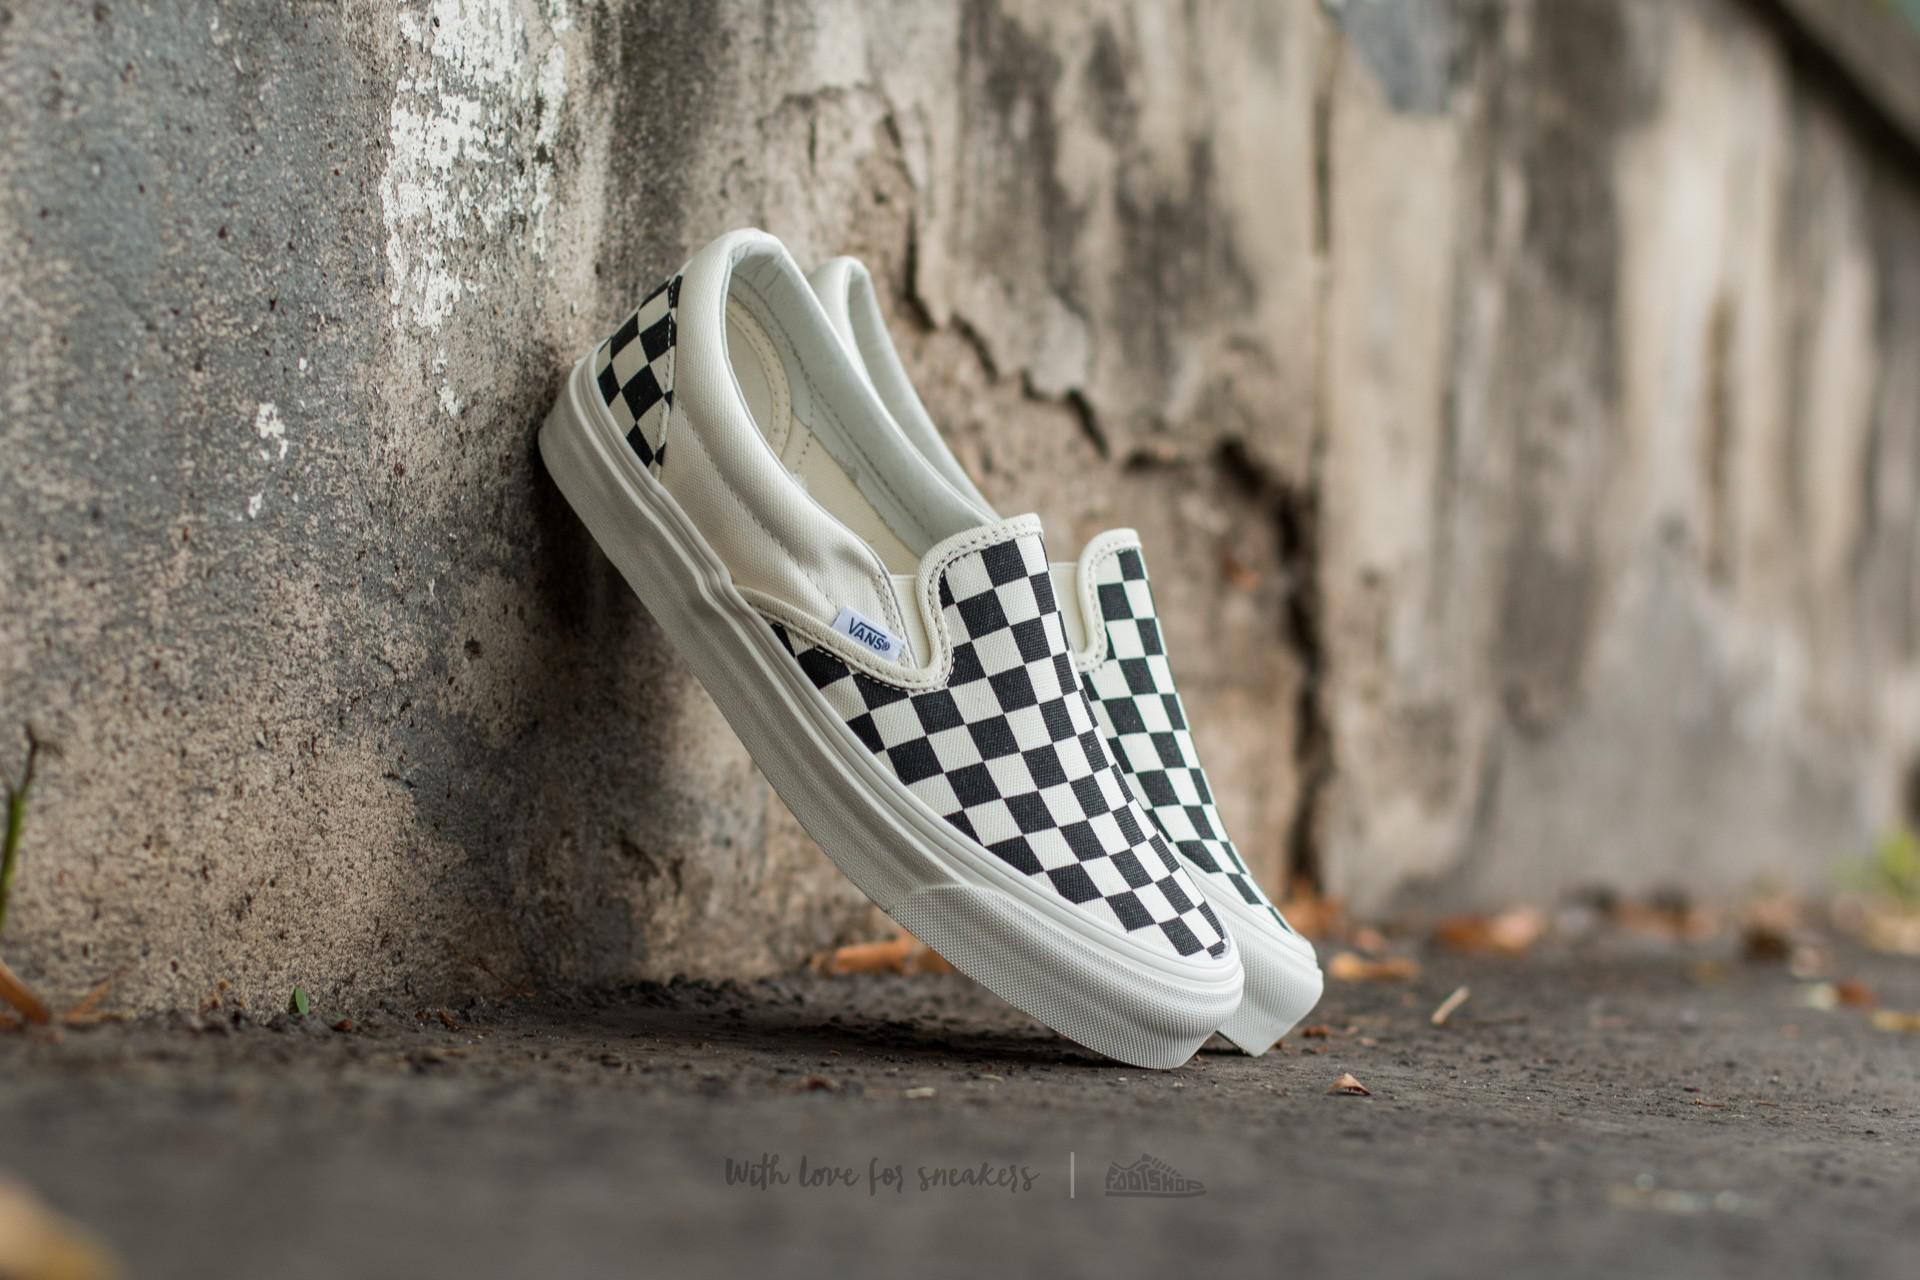 dd0f5e2f037 Lyst - Vans Og Classic Slip On Lx (canvas) Black  White Checkerboard ...